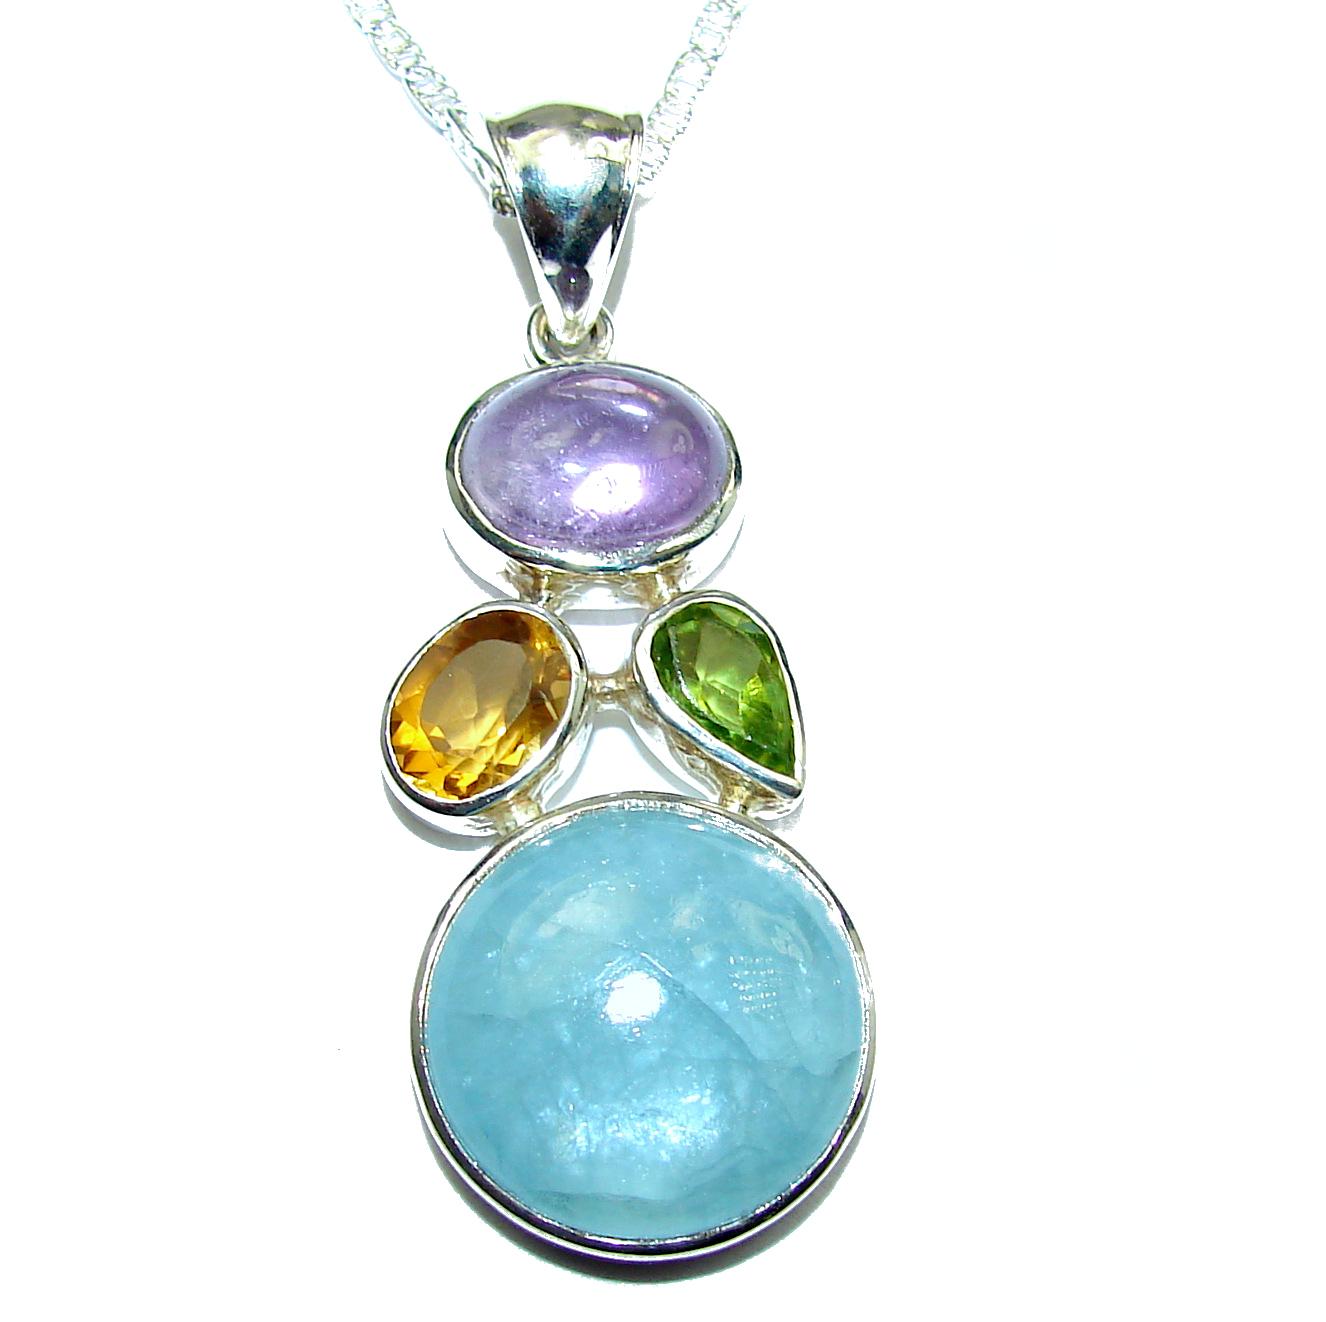 True Art genuine Aquamarine .925 Sterling Silver handcrafted necklace